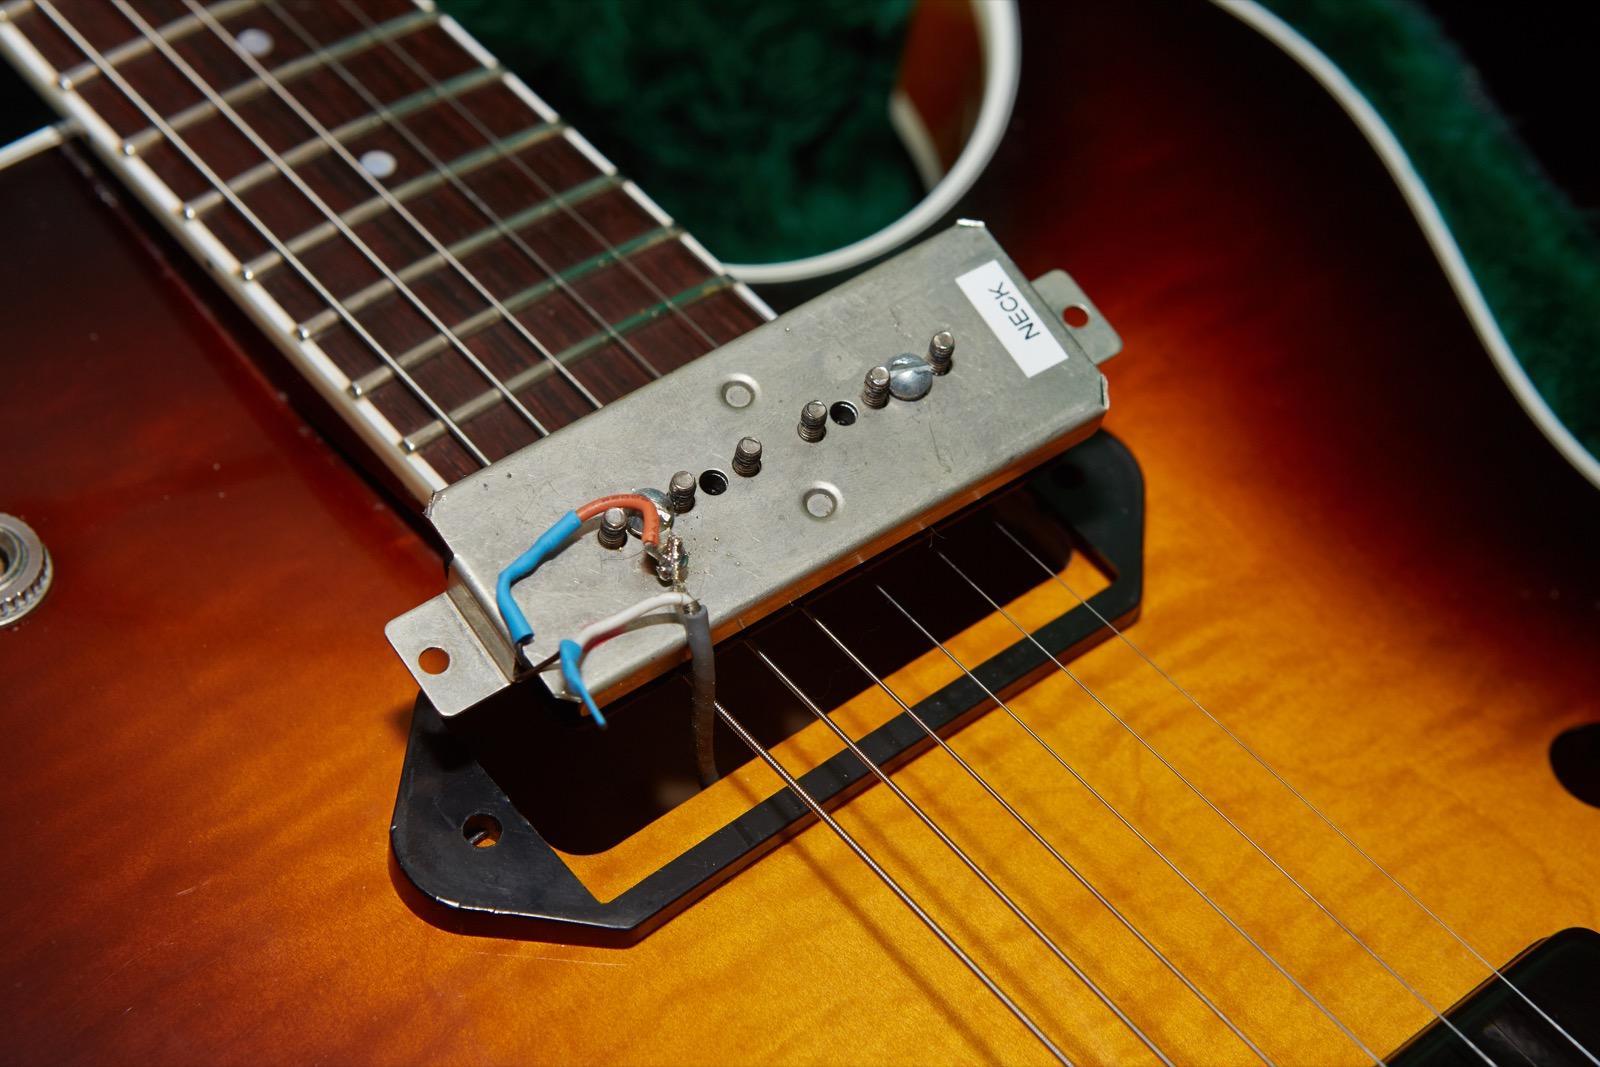 Guild Starfire Iii 90 Gads Ramblings 1961 Gibson P90 Pickups Original Electronics And Wiring Harness 2002 Neck Bottom